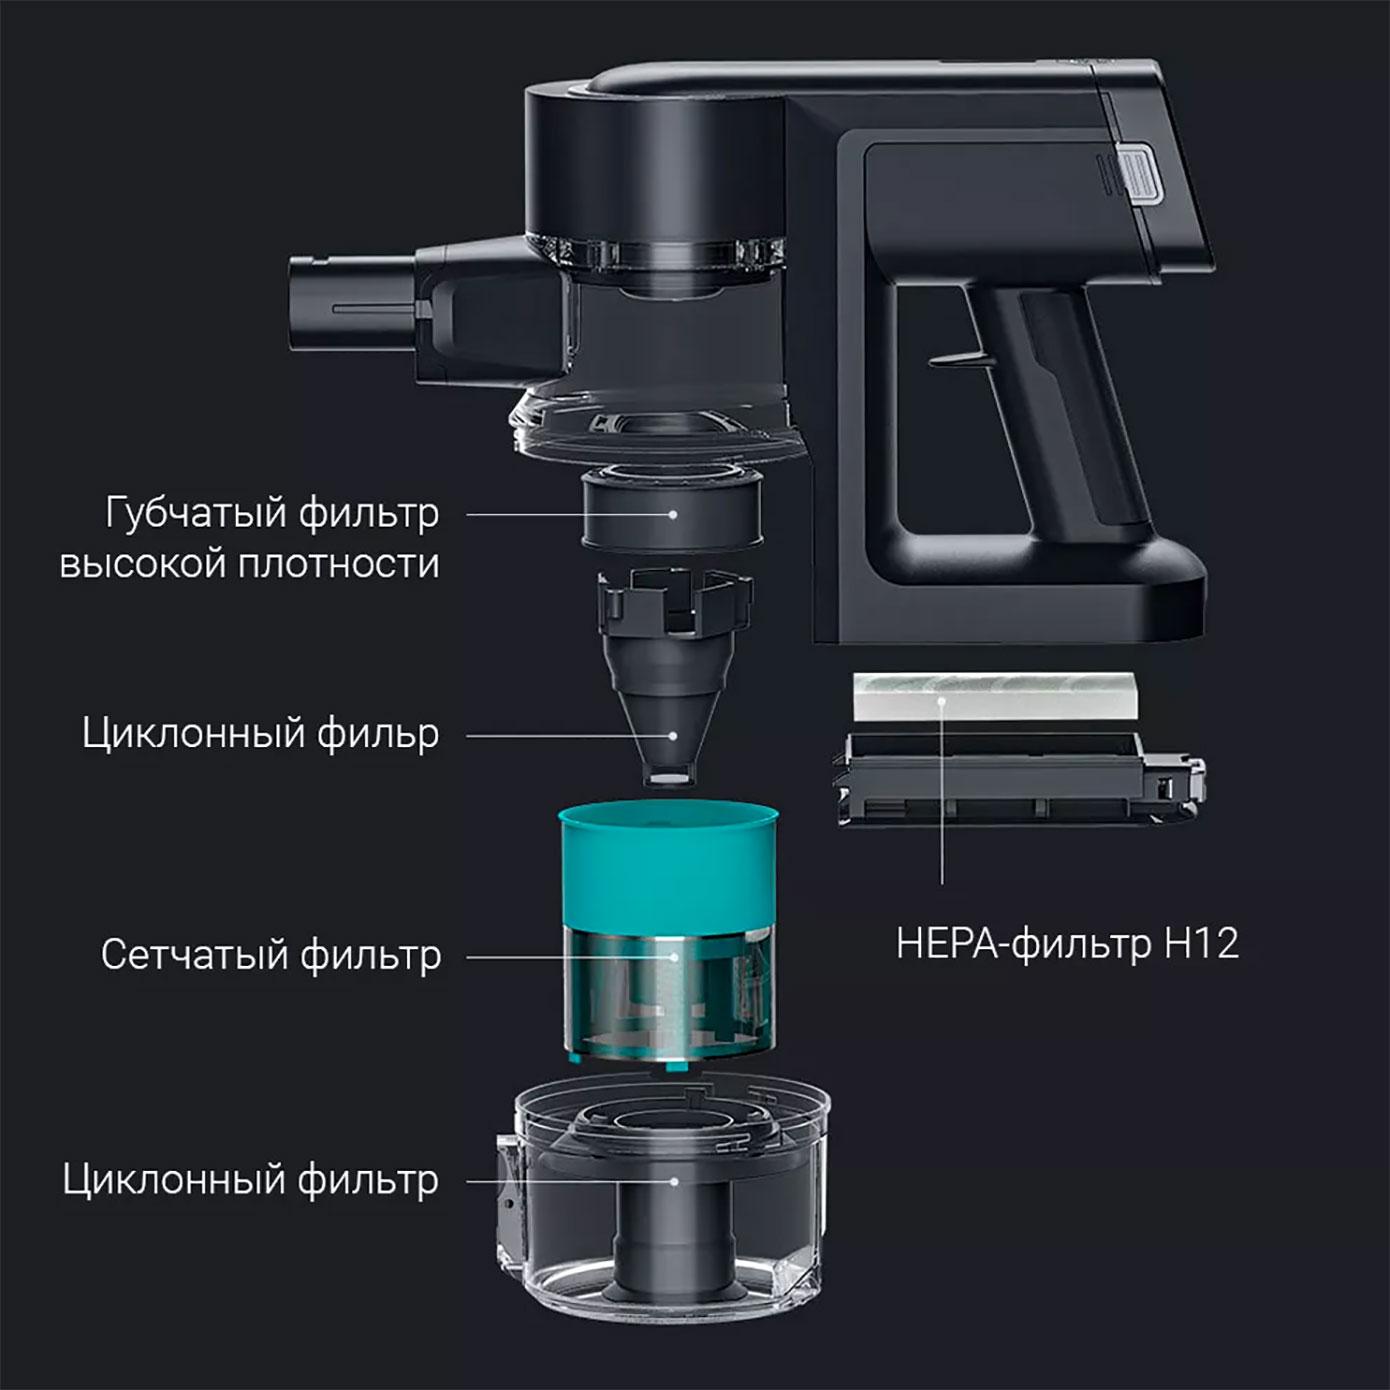 Opisanie Besprovodnoj Ruchnoj Pylesos Viomi A9 Hanheld Wireless Vacuum Cleaner Black 2